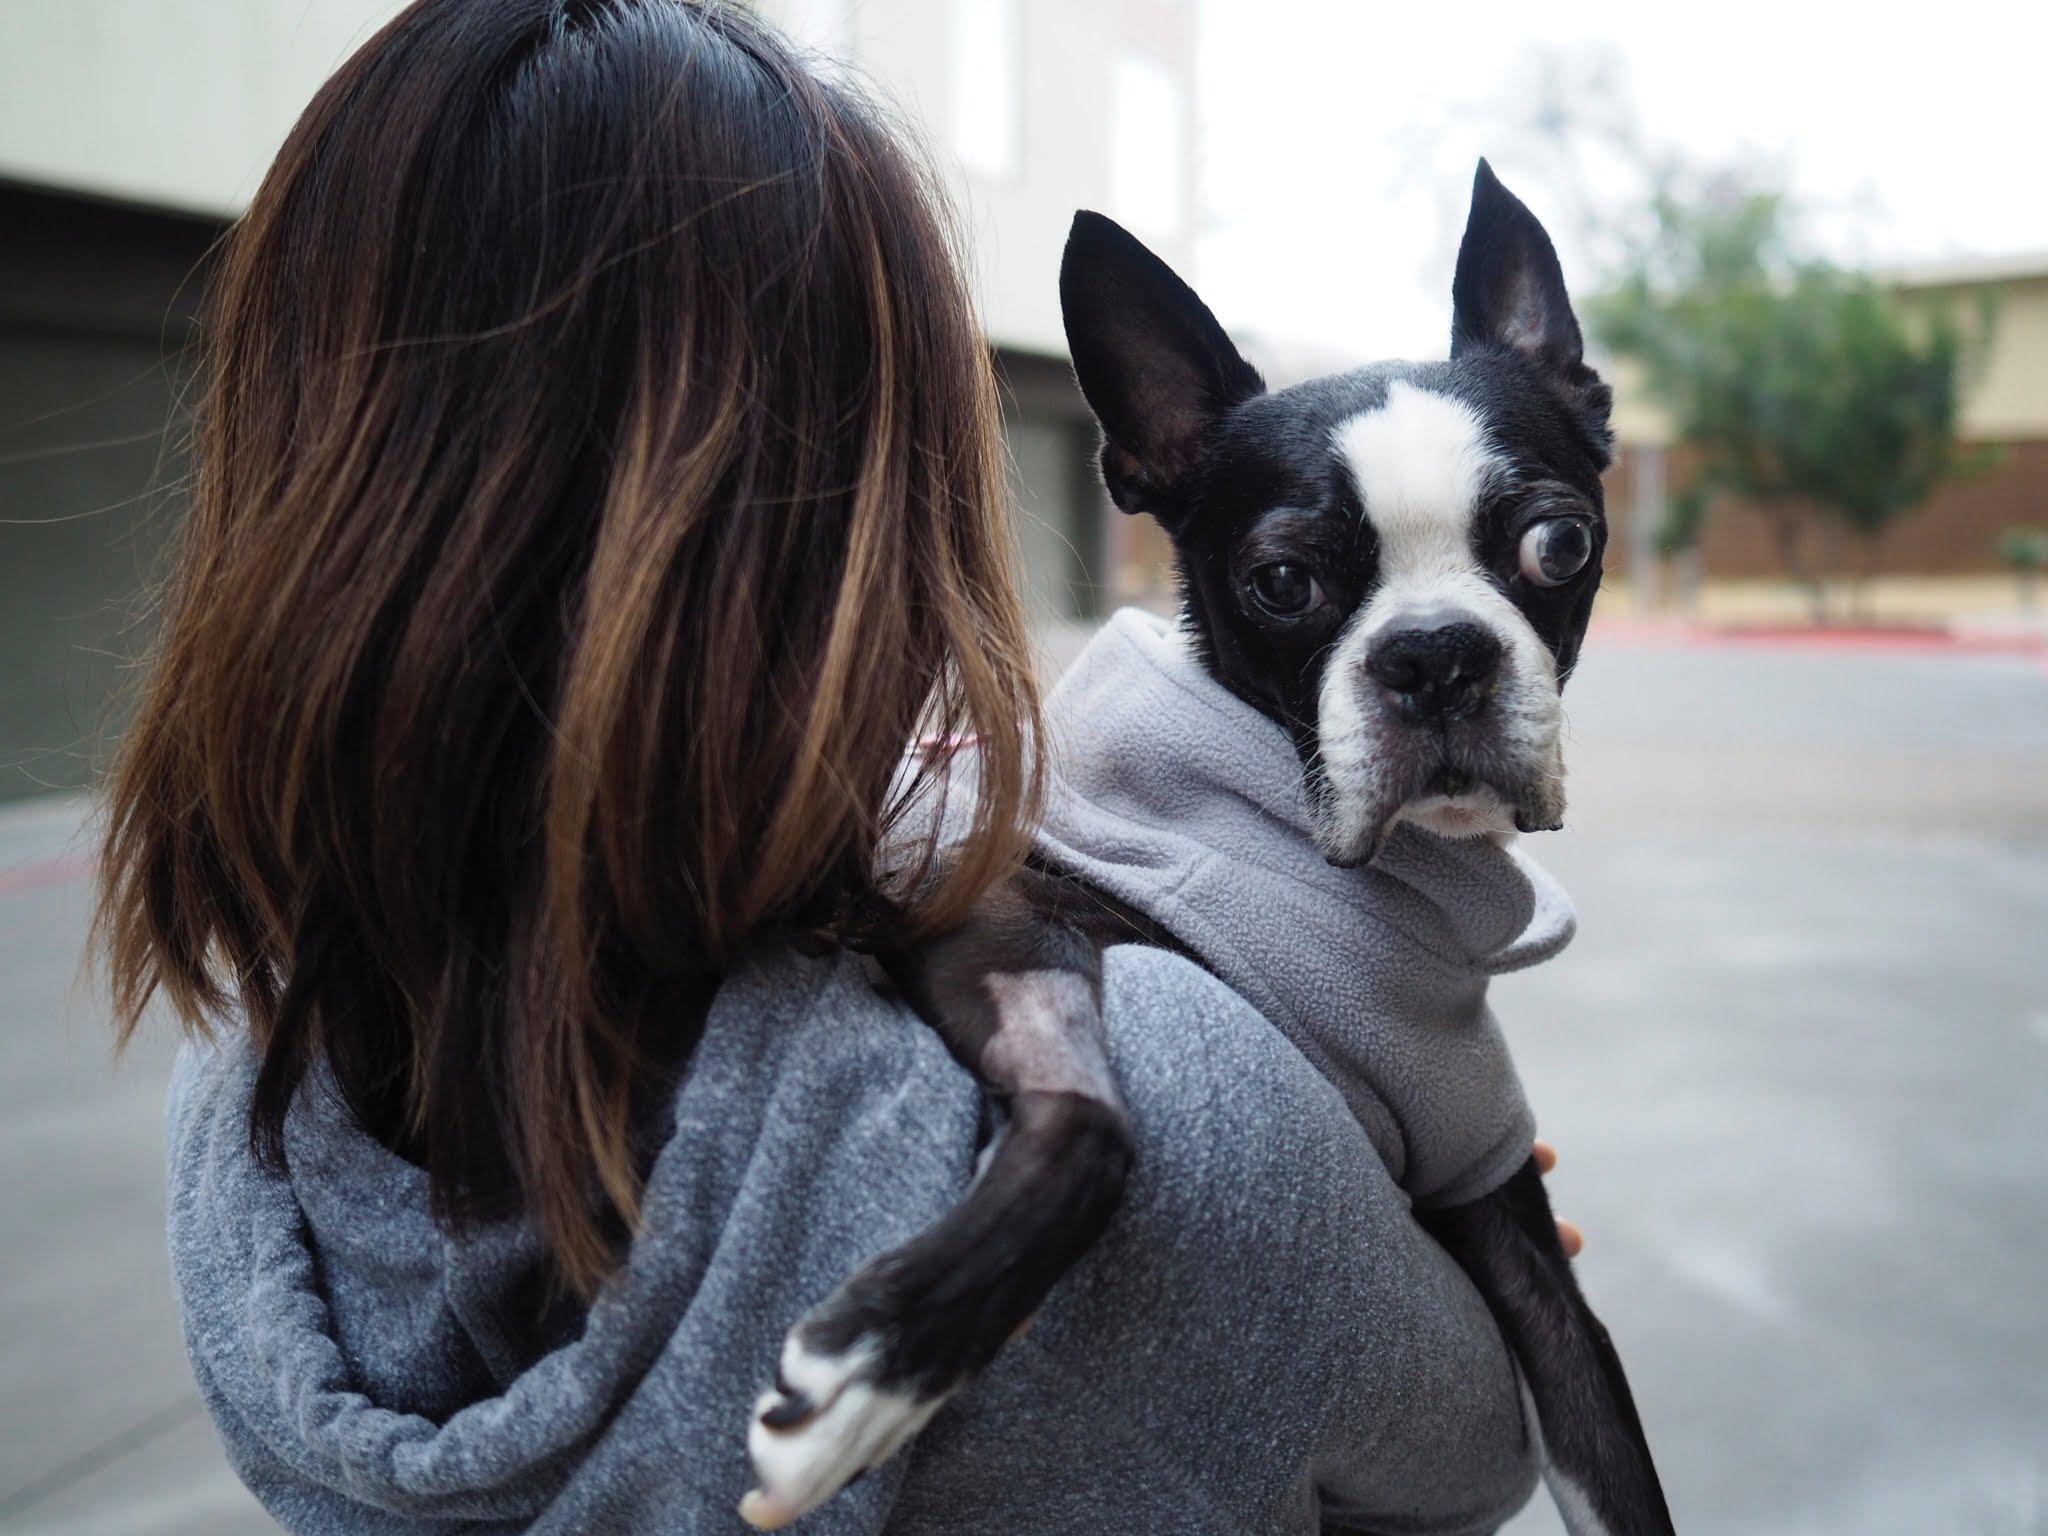 Fullsize Of Dog Acting Weird